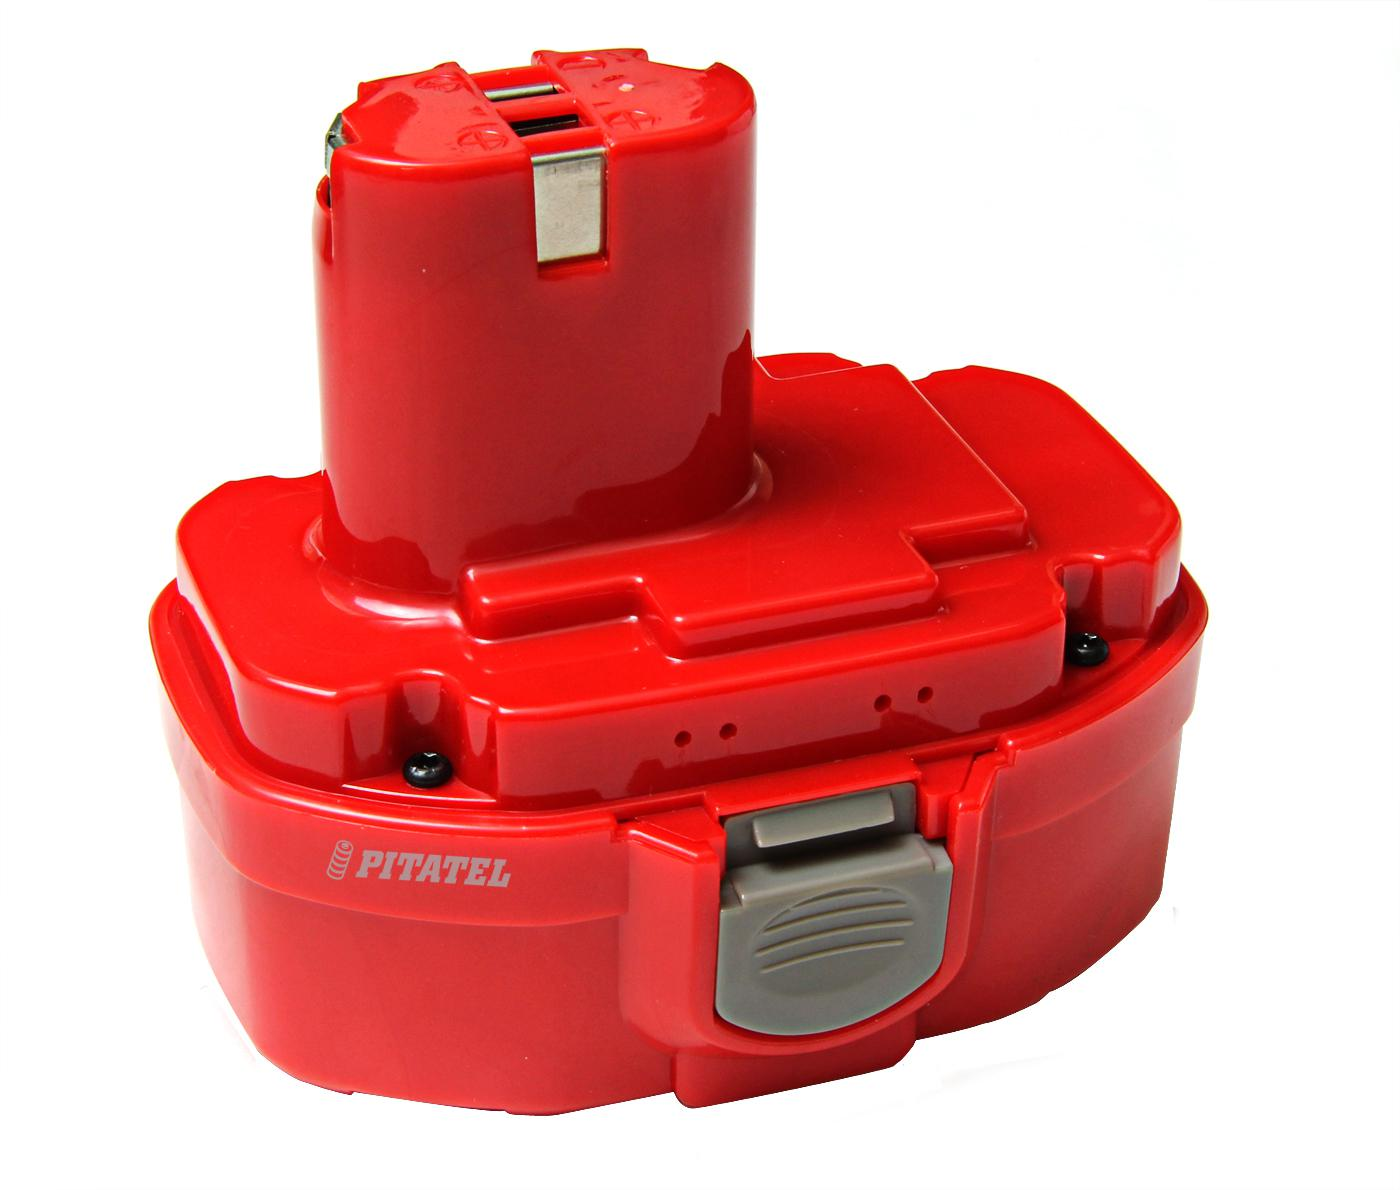 Аккумулятор Pitatel Tsb-033-mak18a-21m батарея аккумуляторная pitatel tsb 025 hit14a 21m